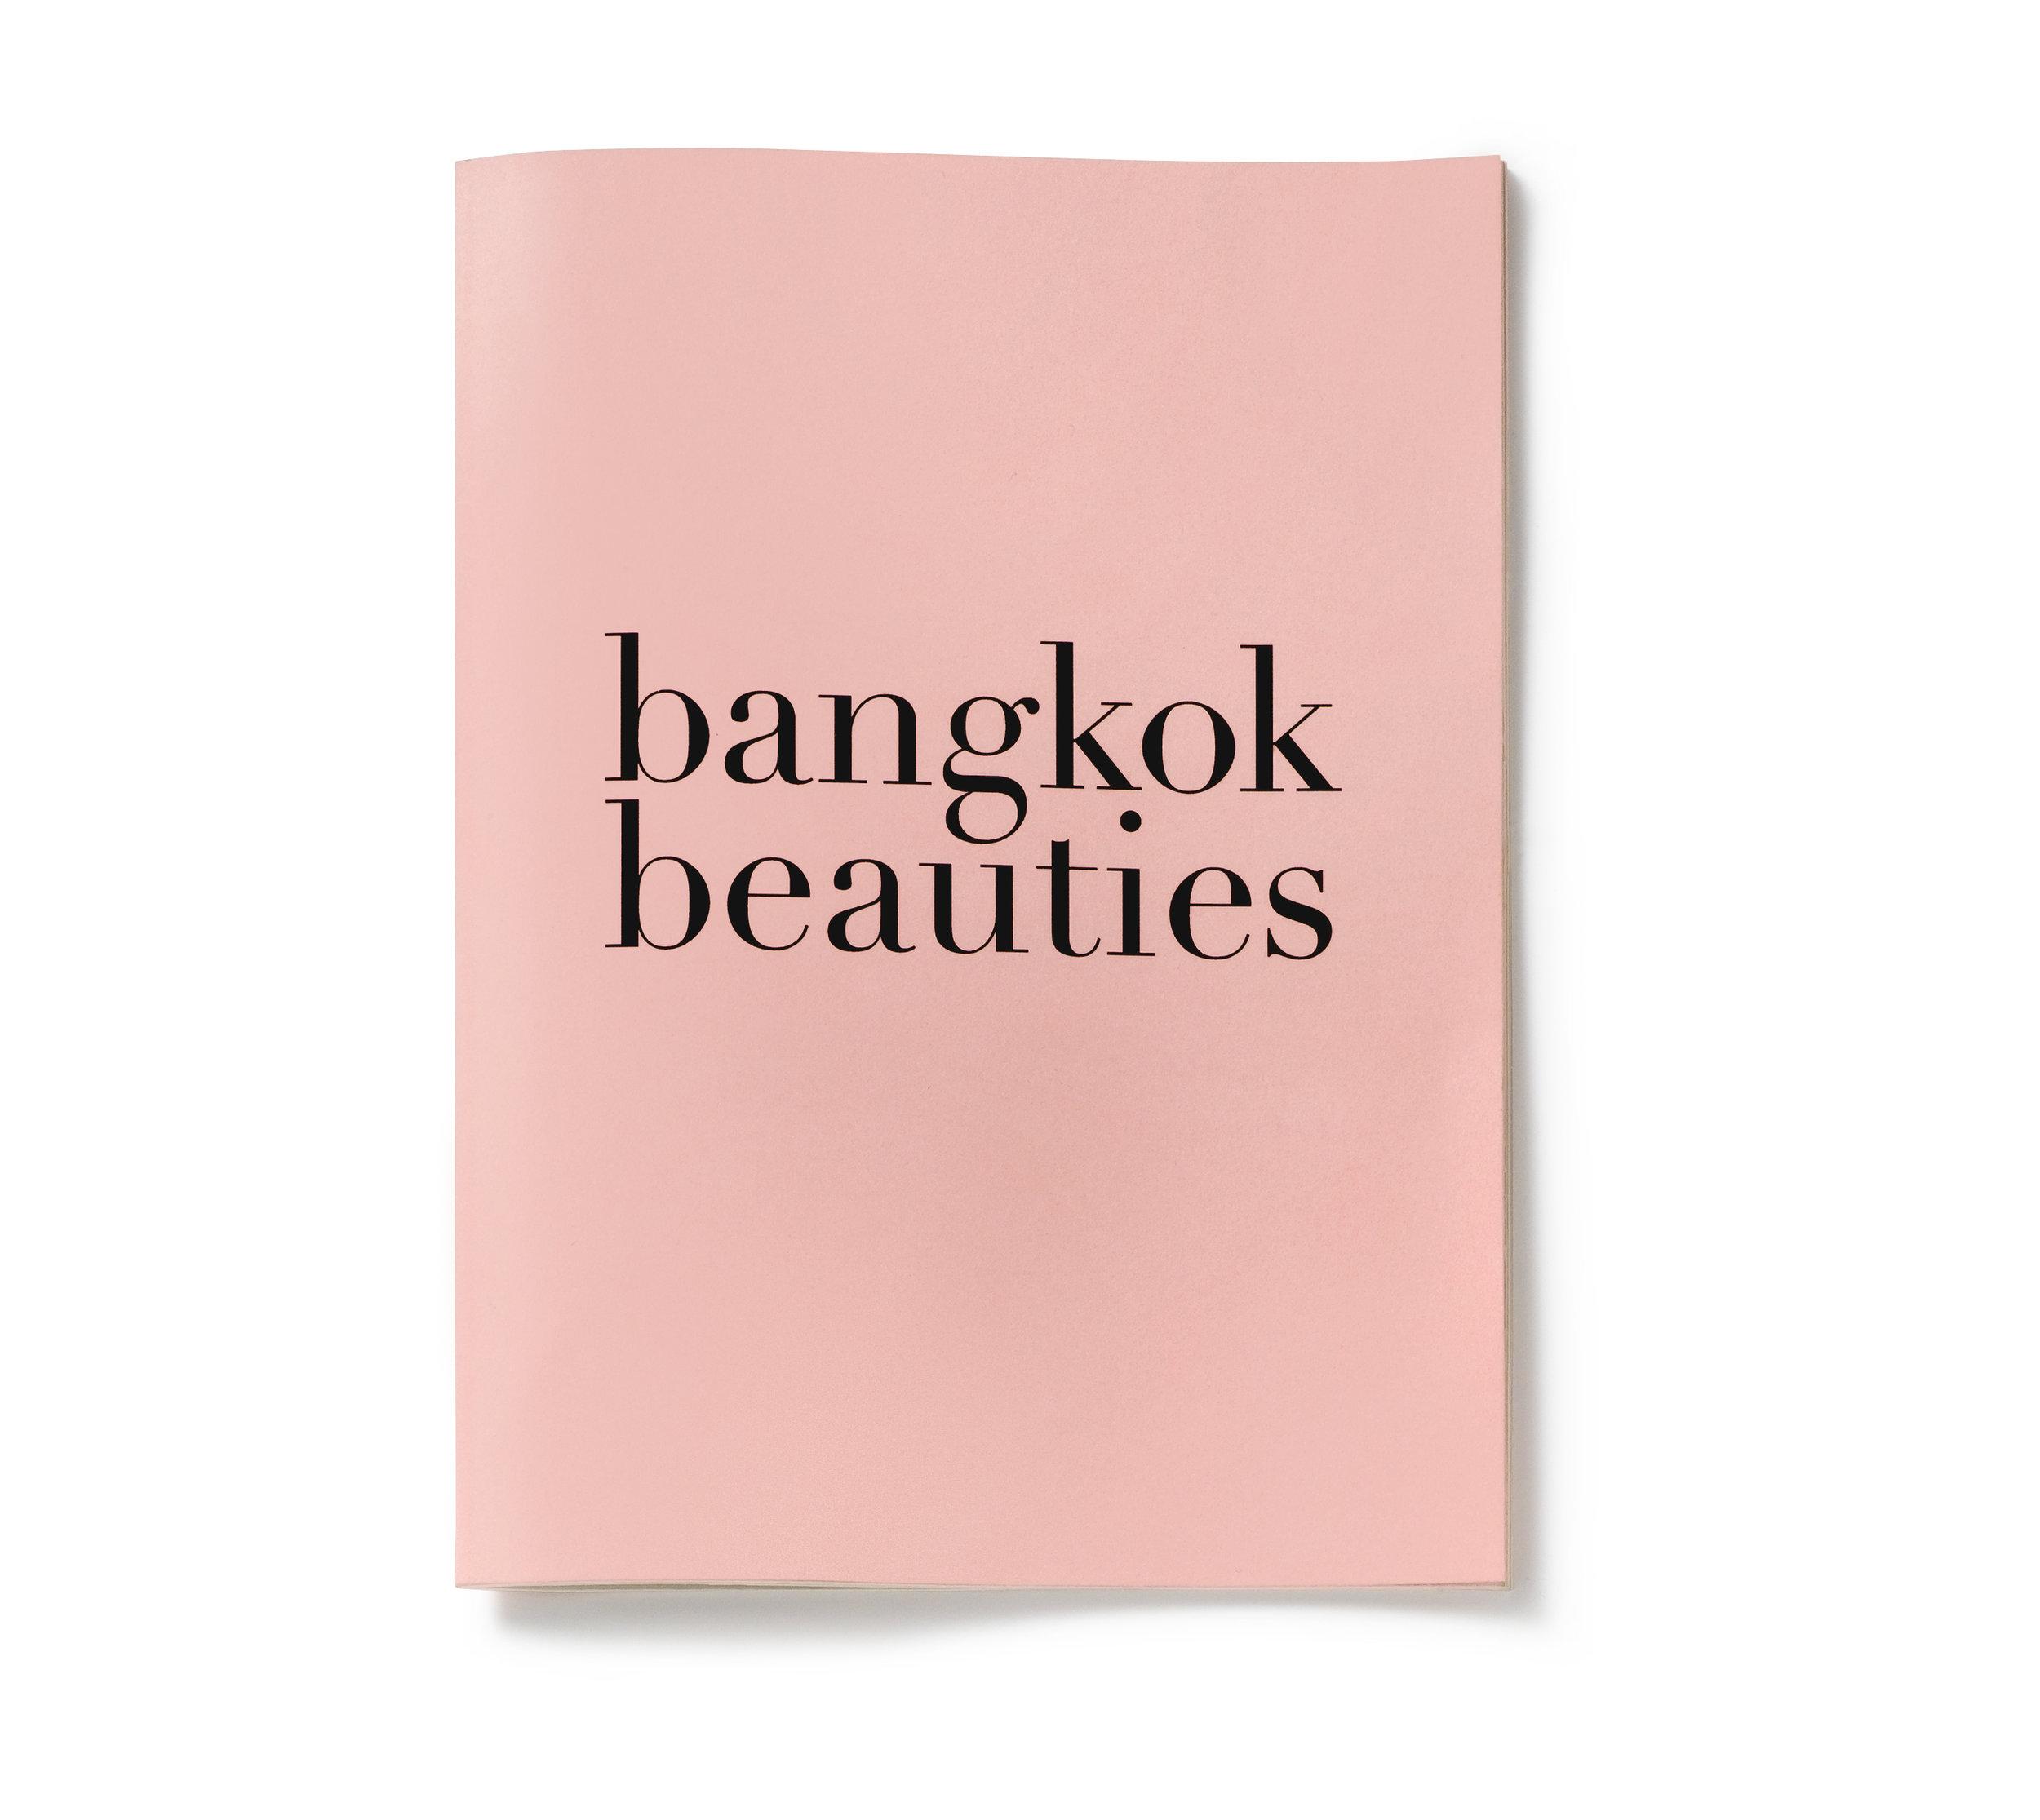 bangkok beauties cover.jpg